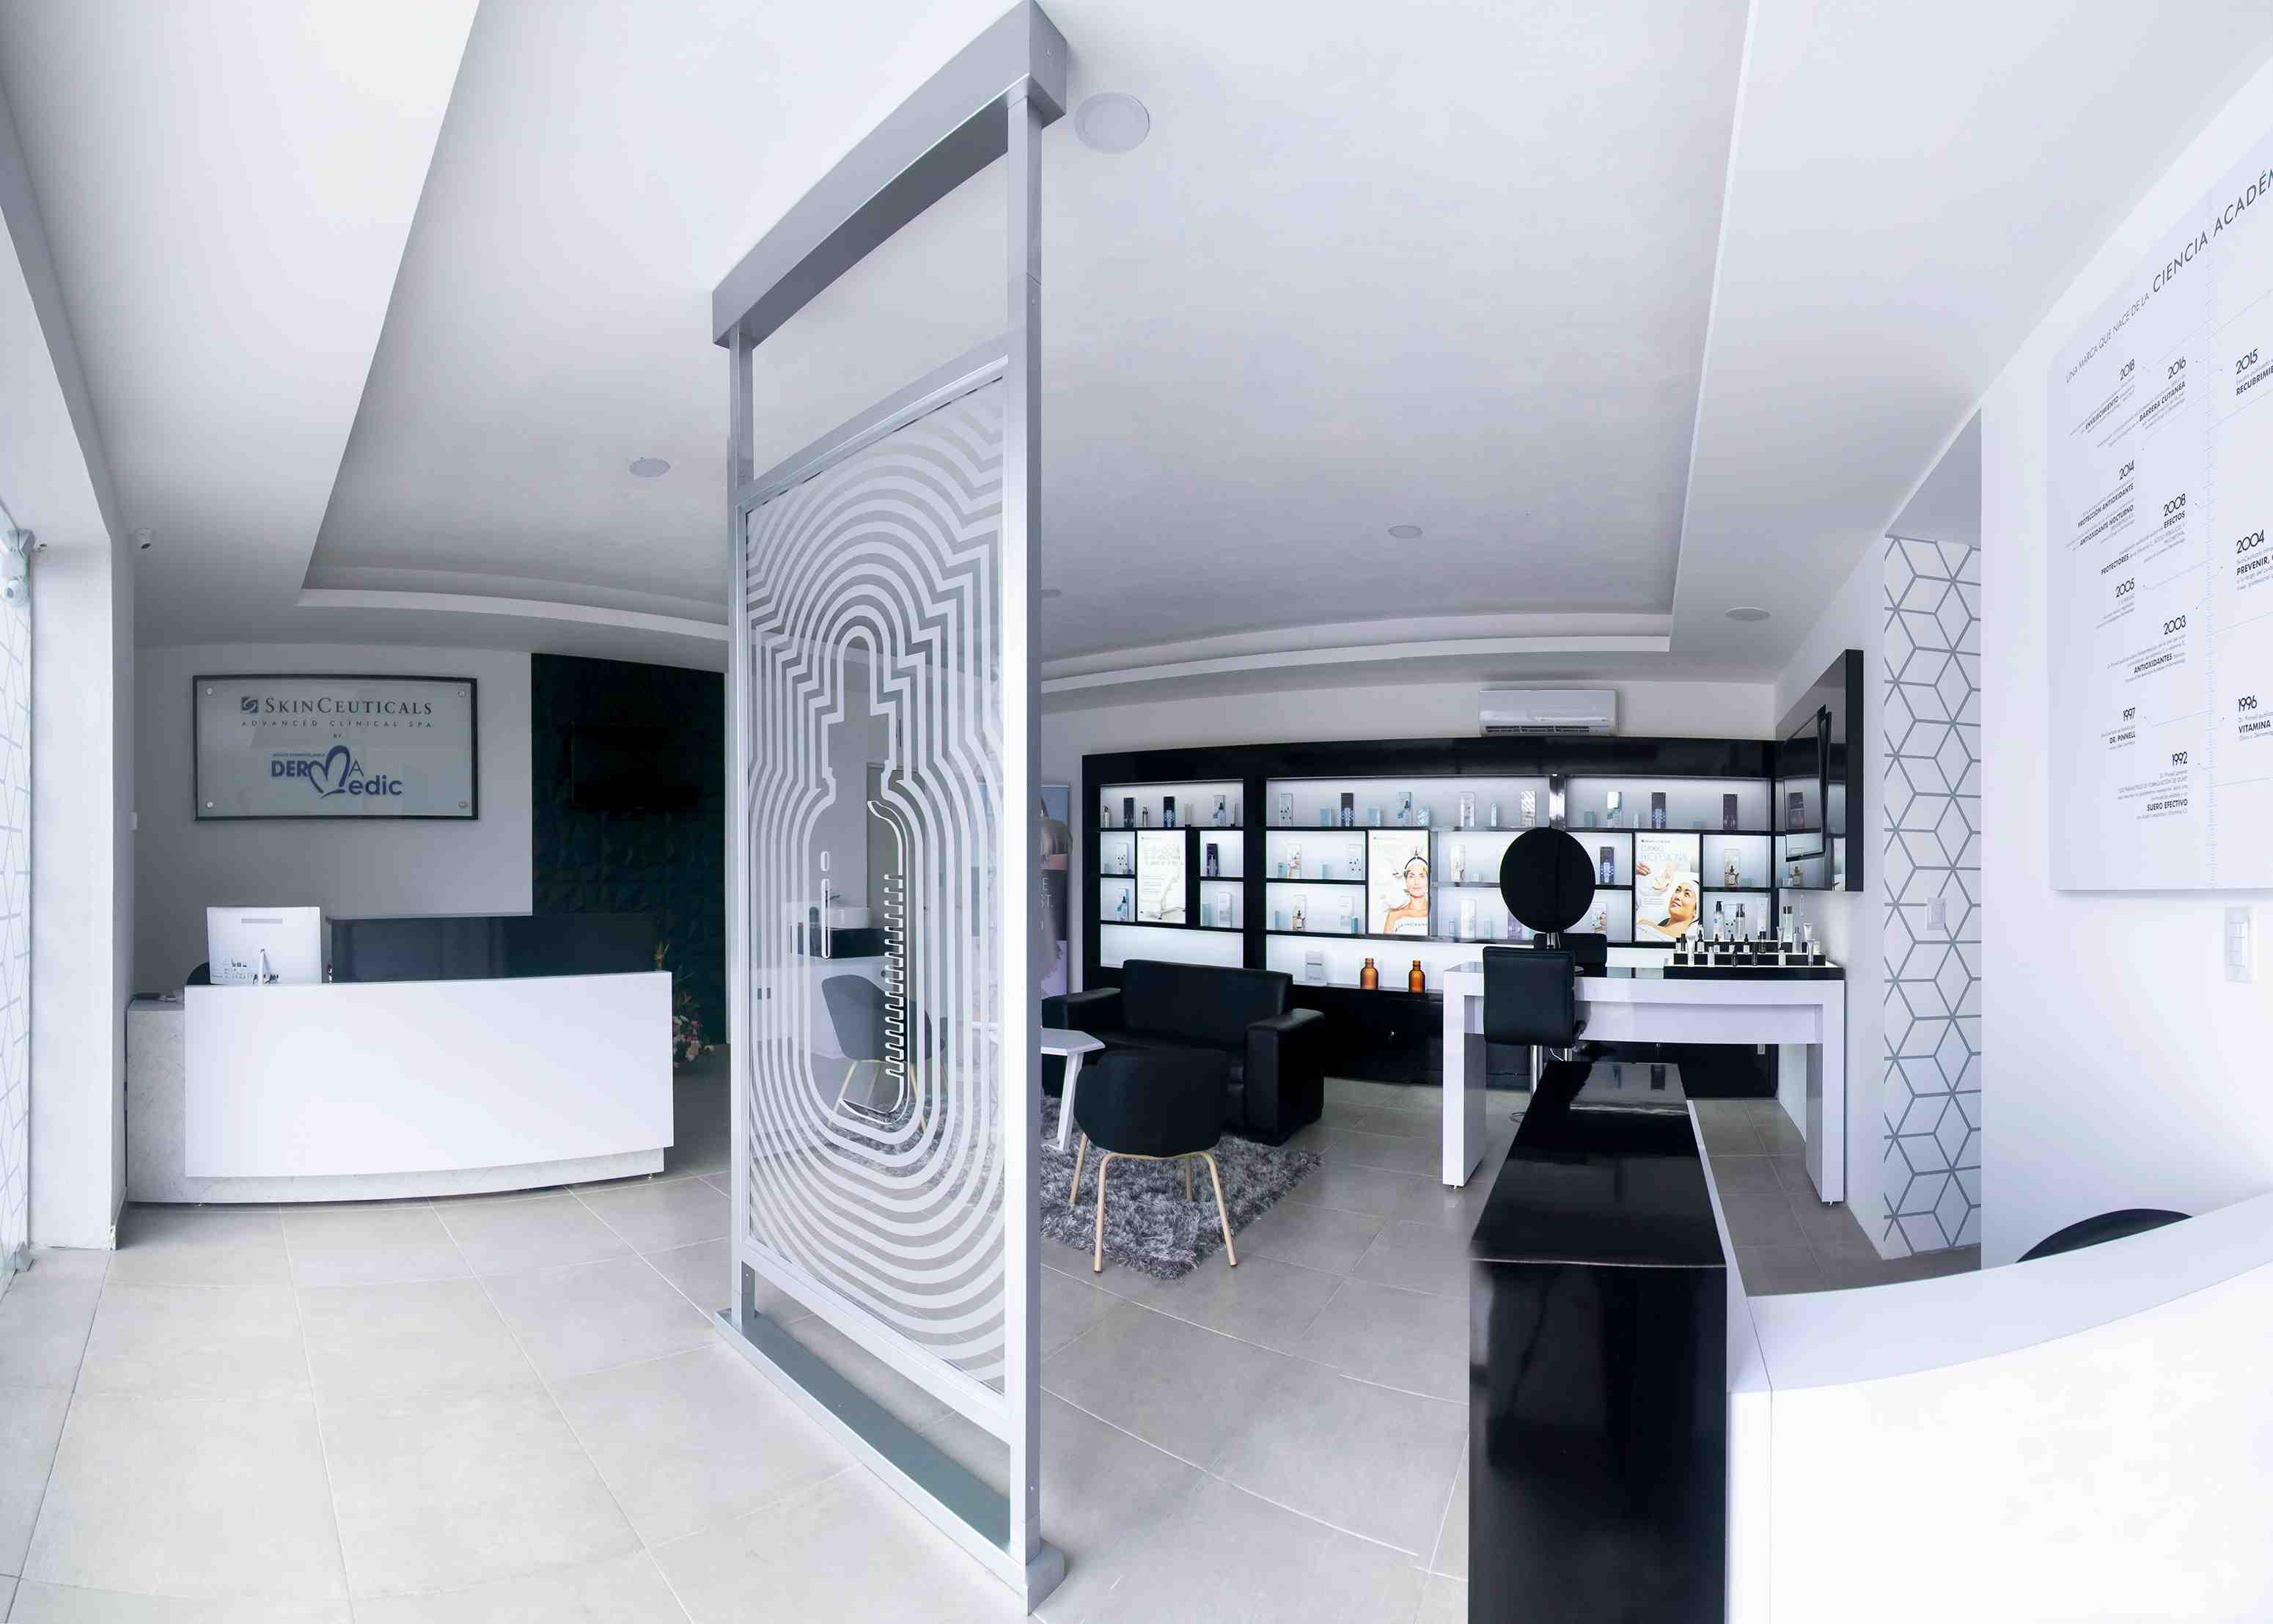 Interior Derma Medic